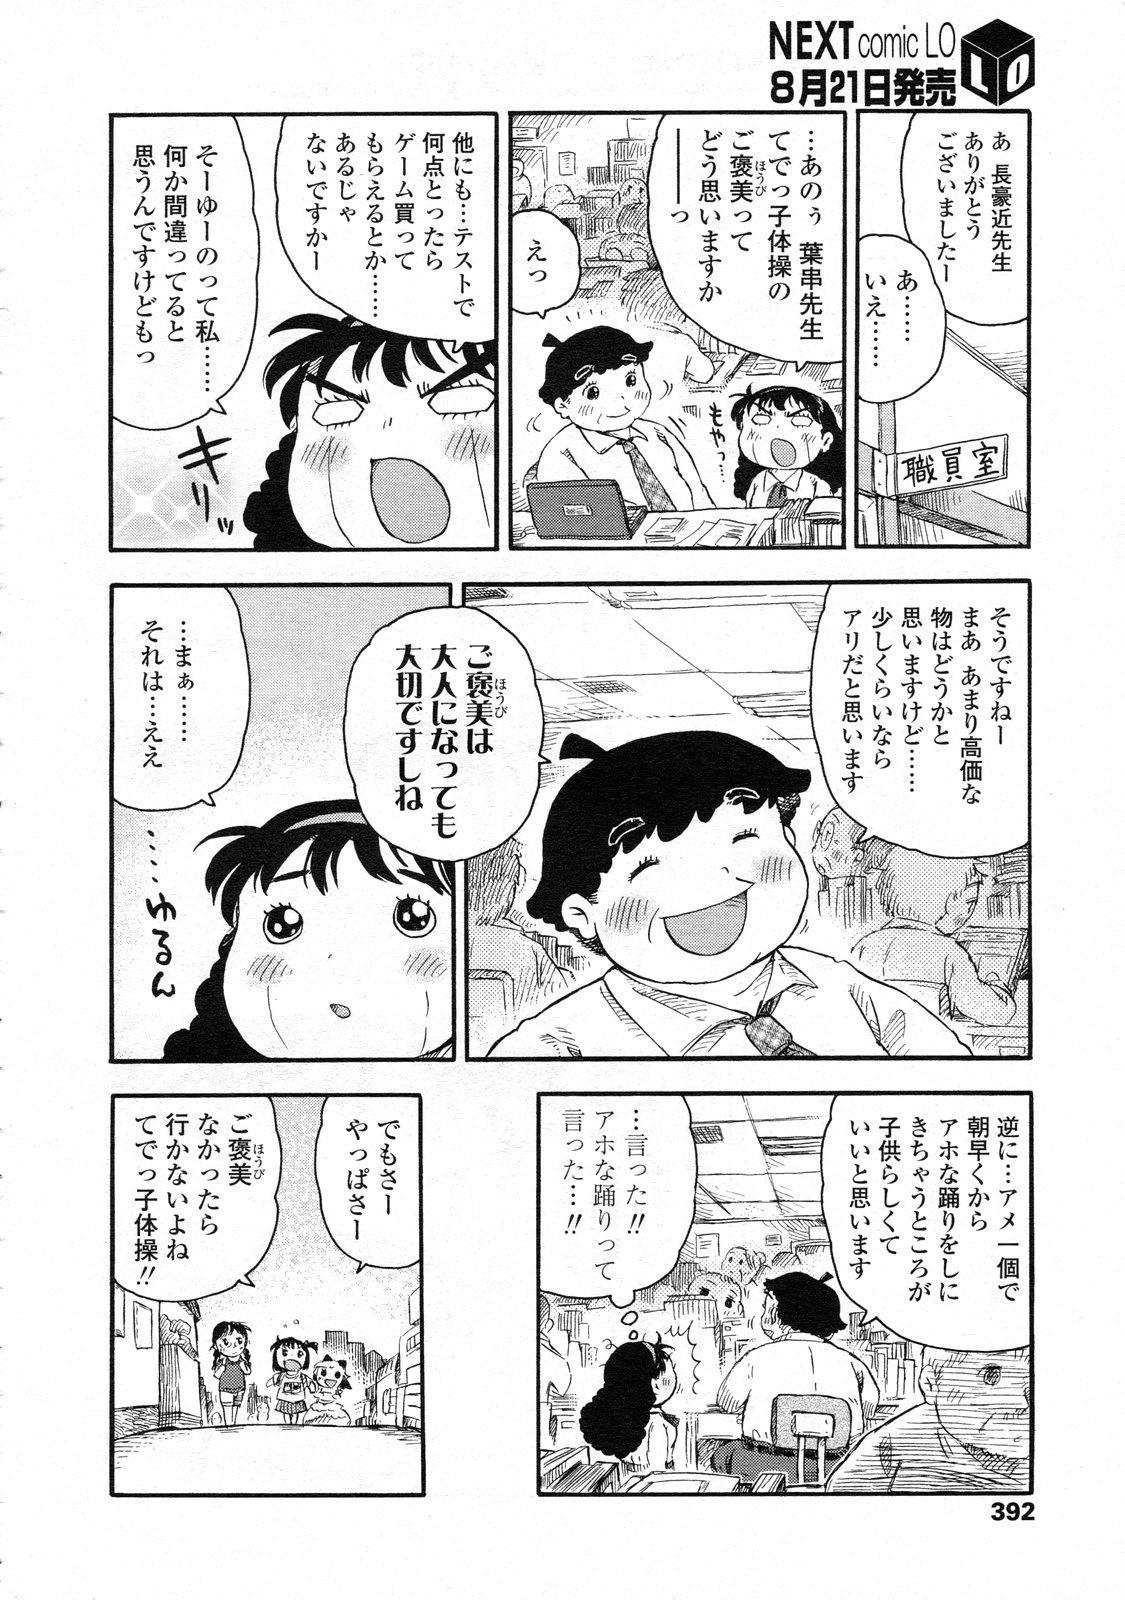 COMIC LO 2009-09 Vol. 66 392